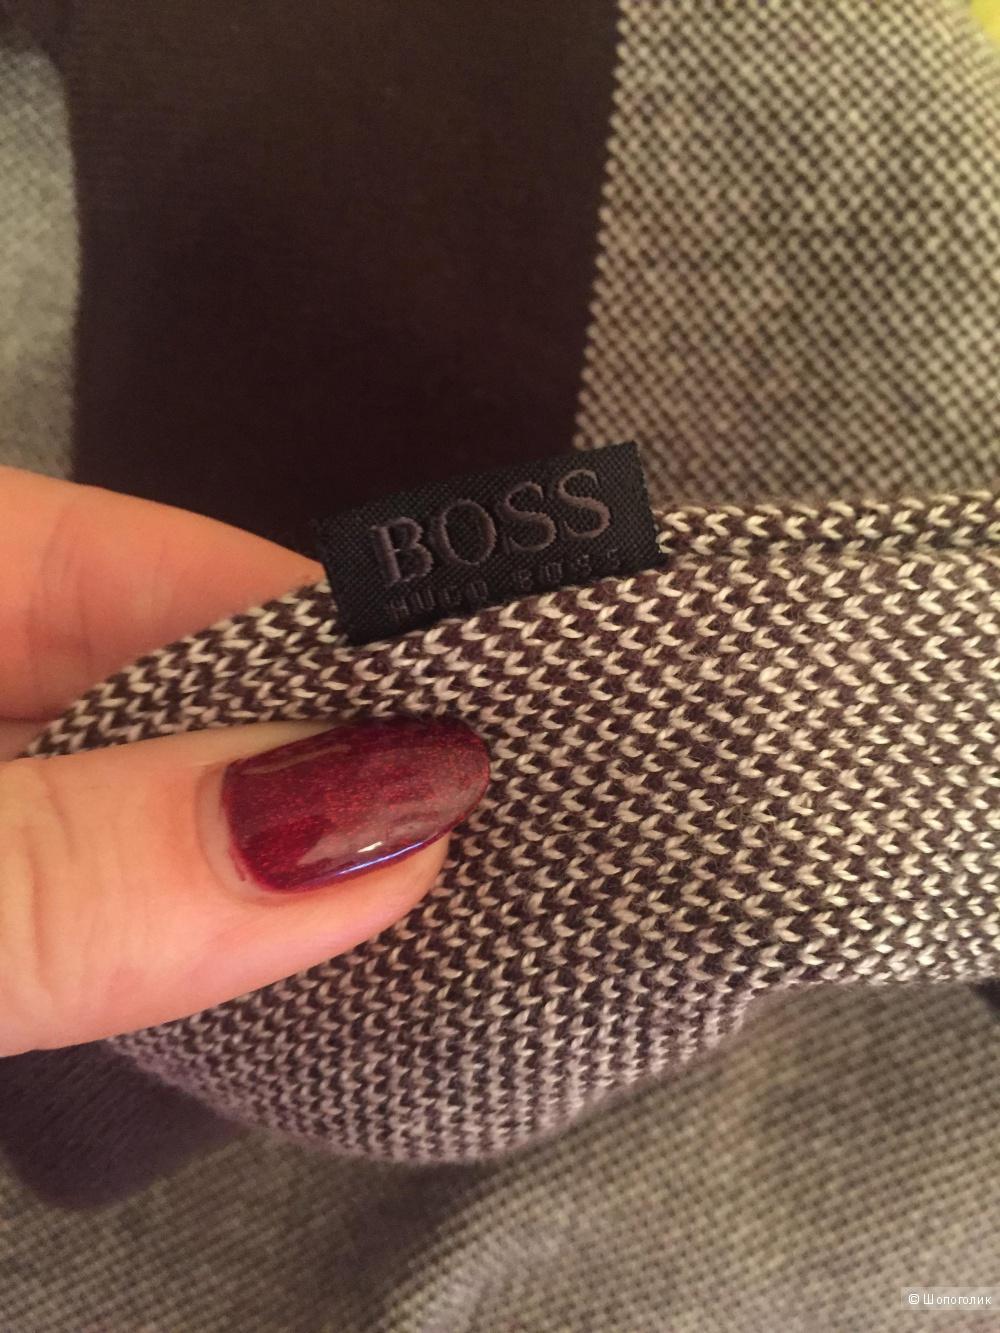 Джемпер Hugo Boss. 54 размер XL